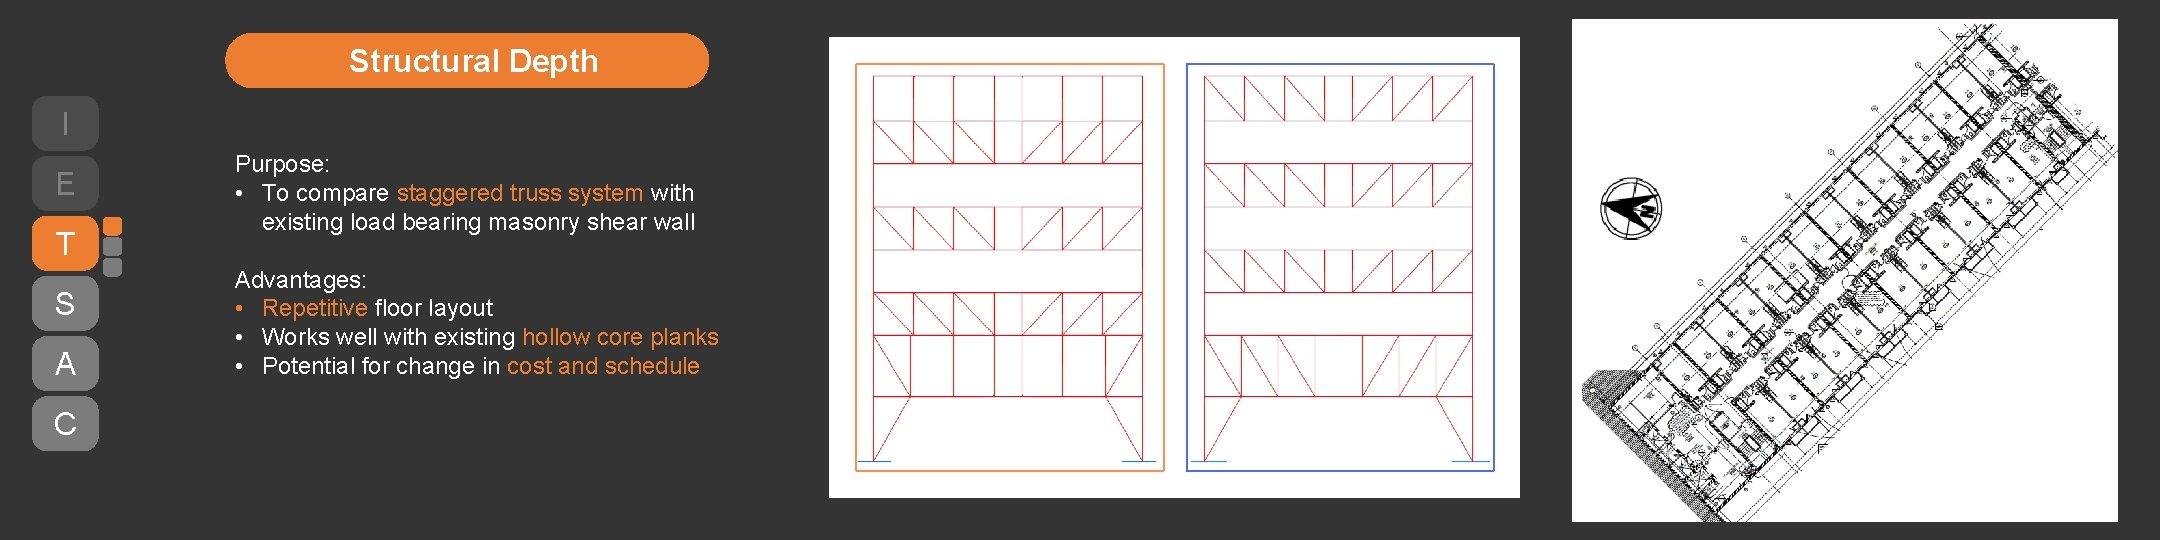 Structural Depth I E T S A C Purpose: • To compare staggered truss